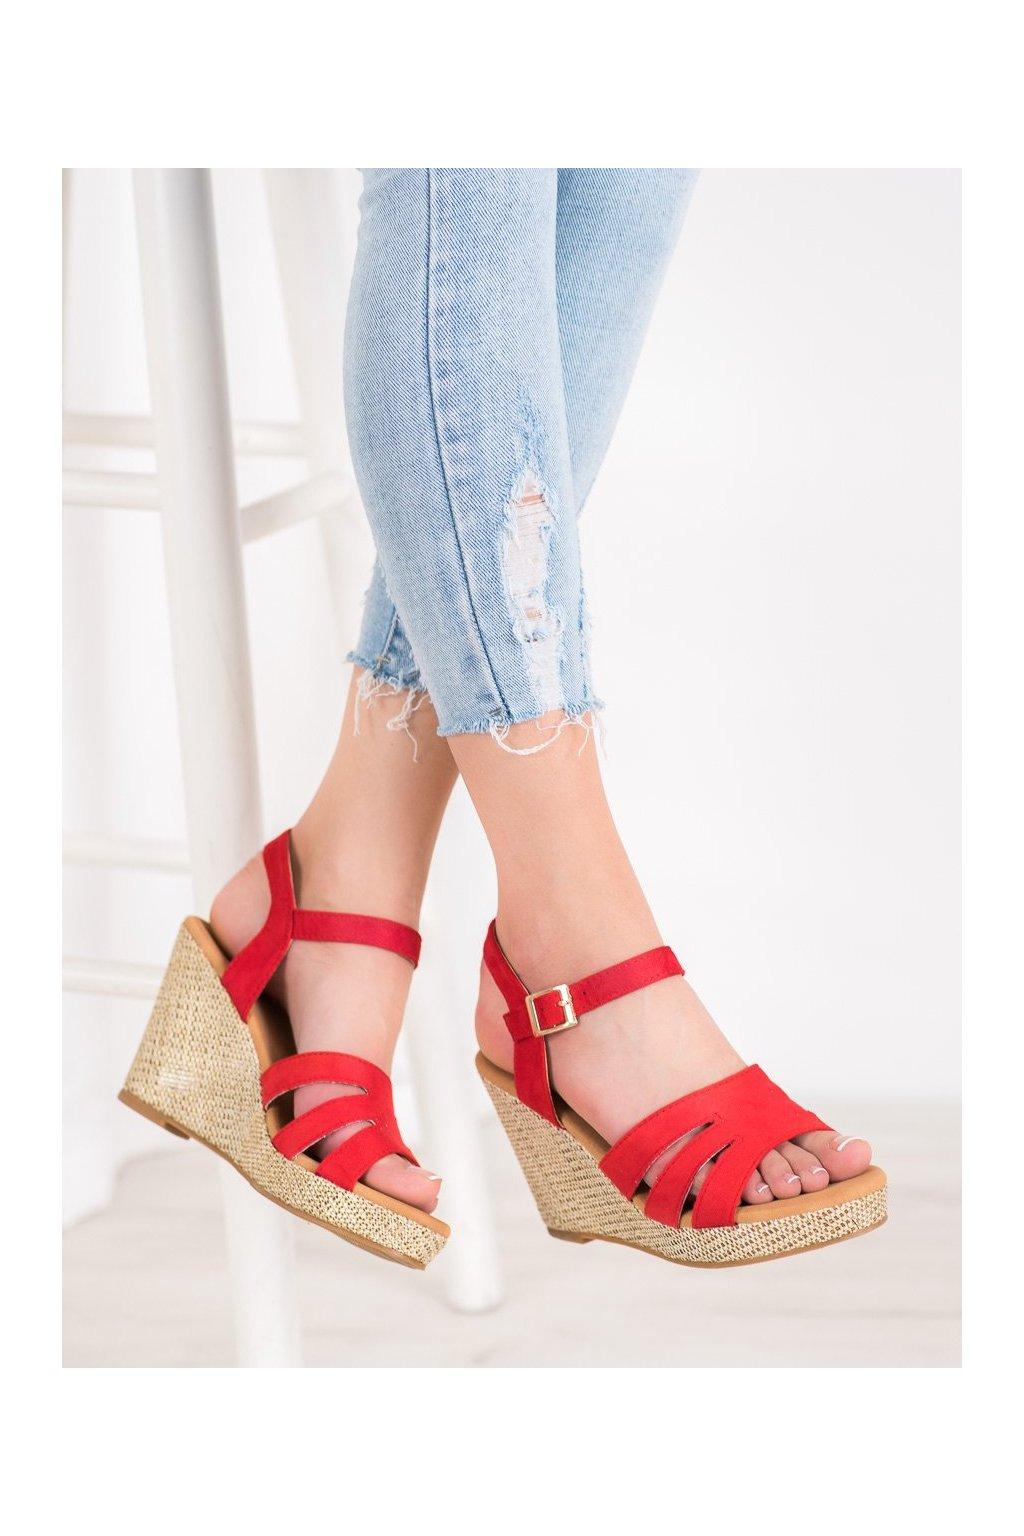 Červené sandále Small swan kod BL-20R